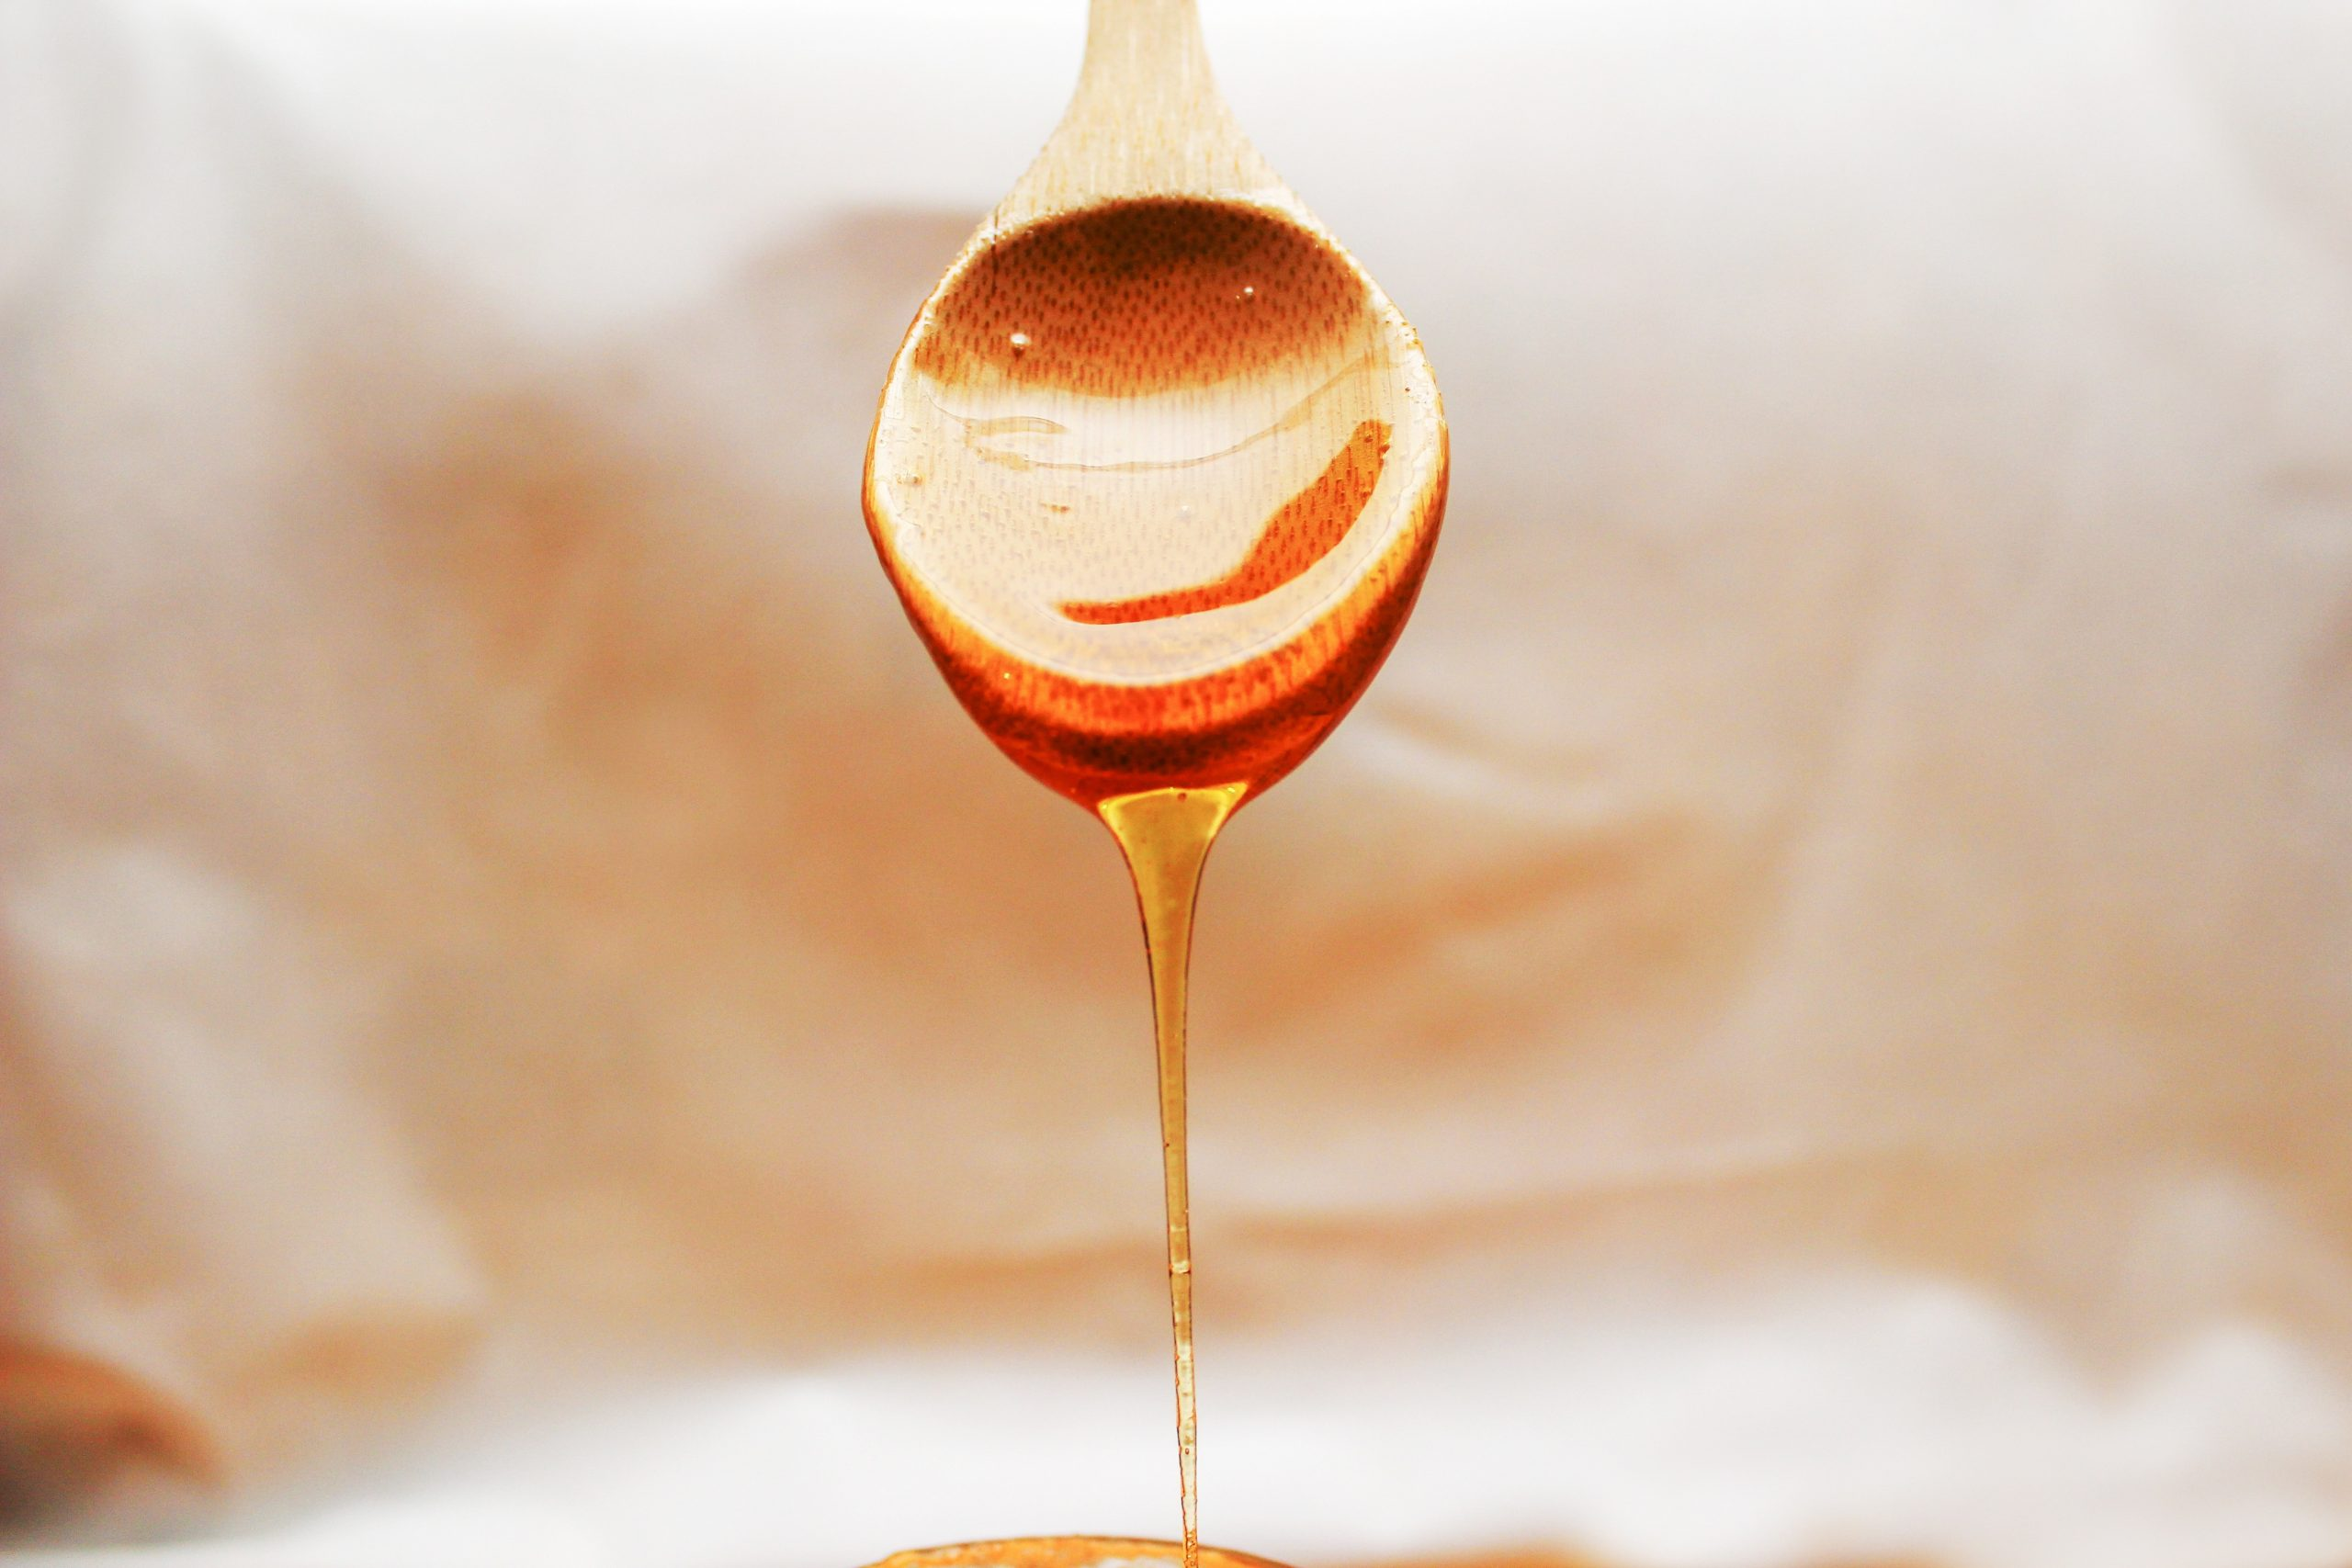 Manfaat Madu Sebagai Pengganti Gula